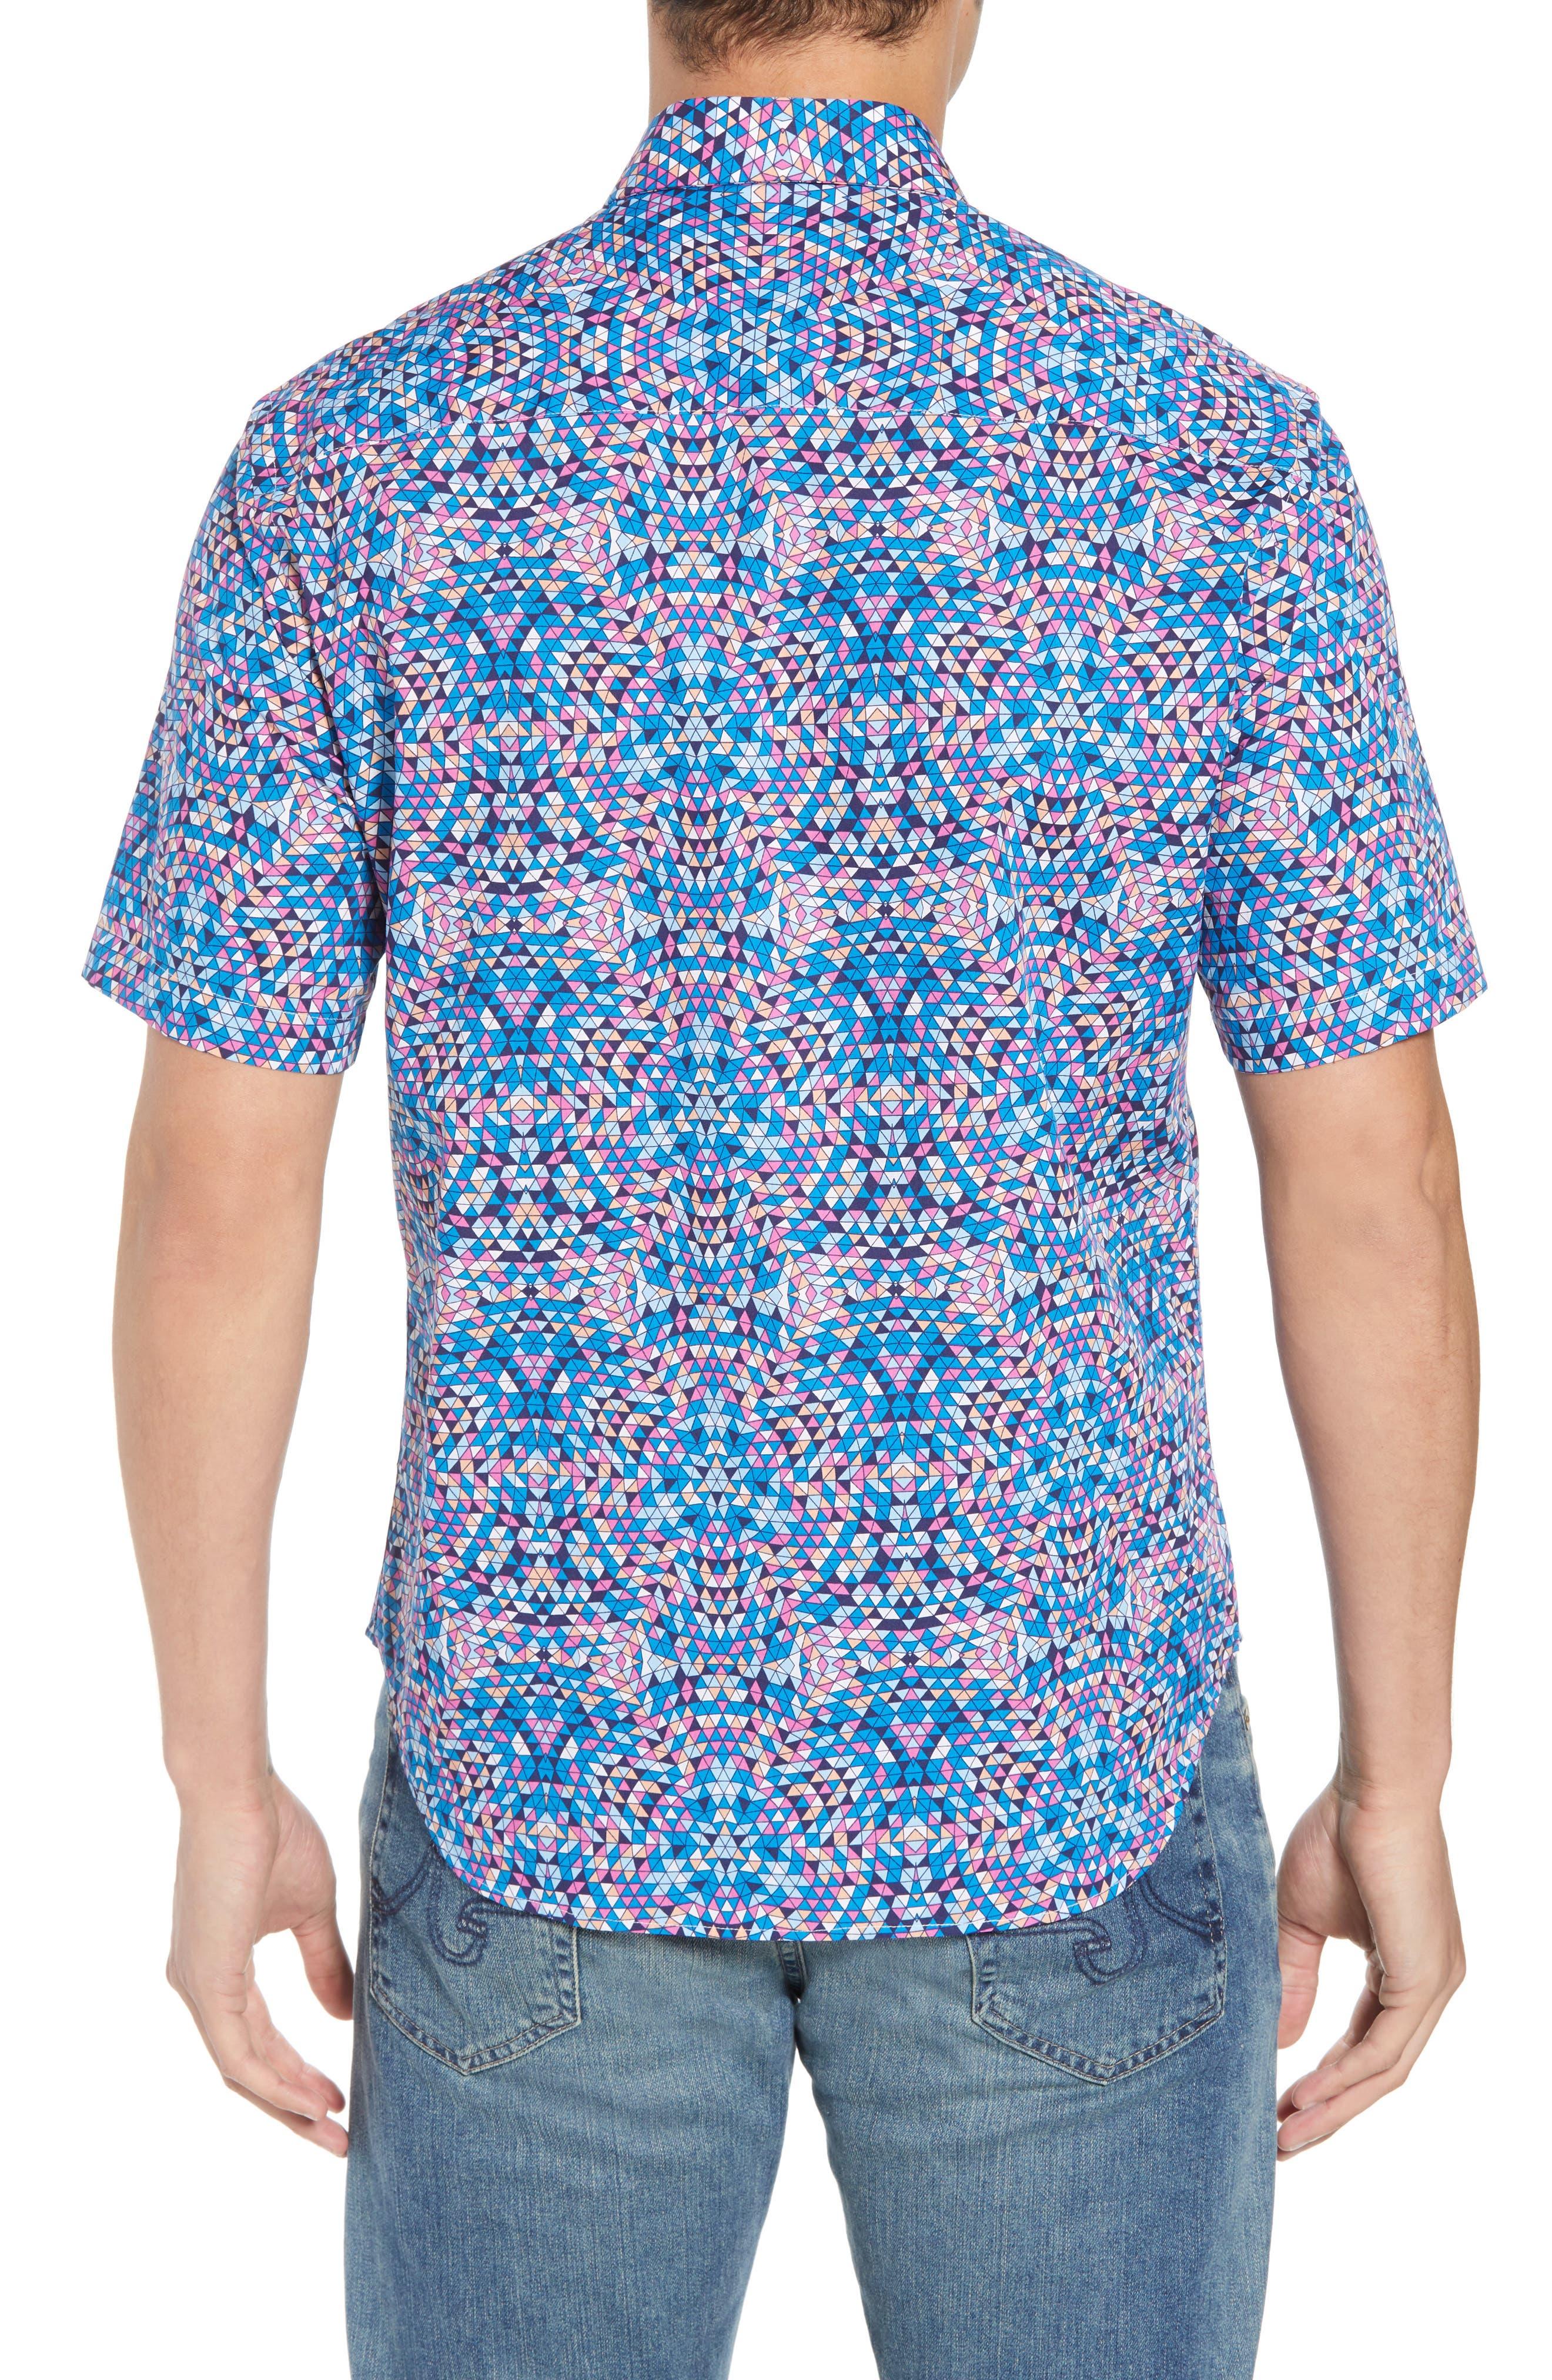 Anton Regular Fit Sport Shirt,                             Alternate thumbnail 3, color,                             Teal